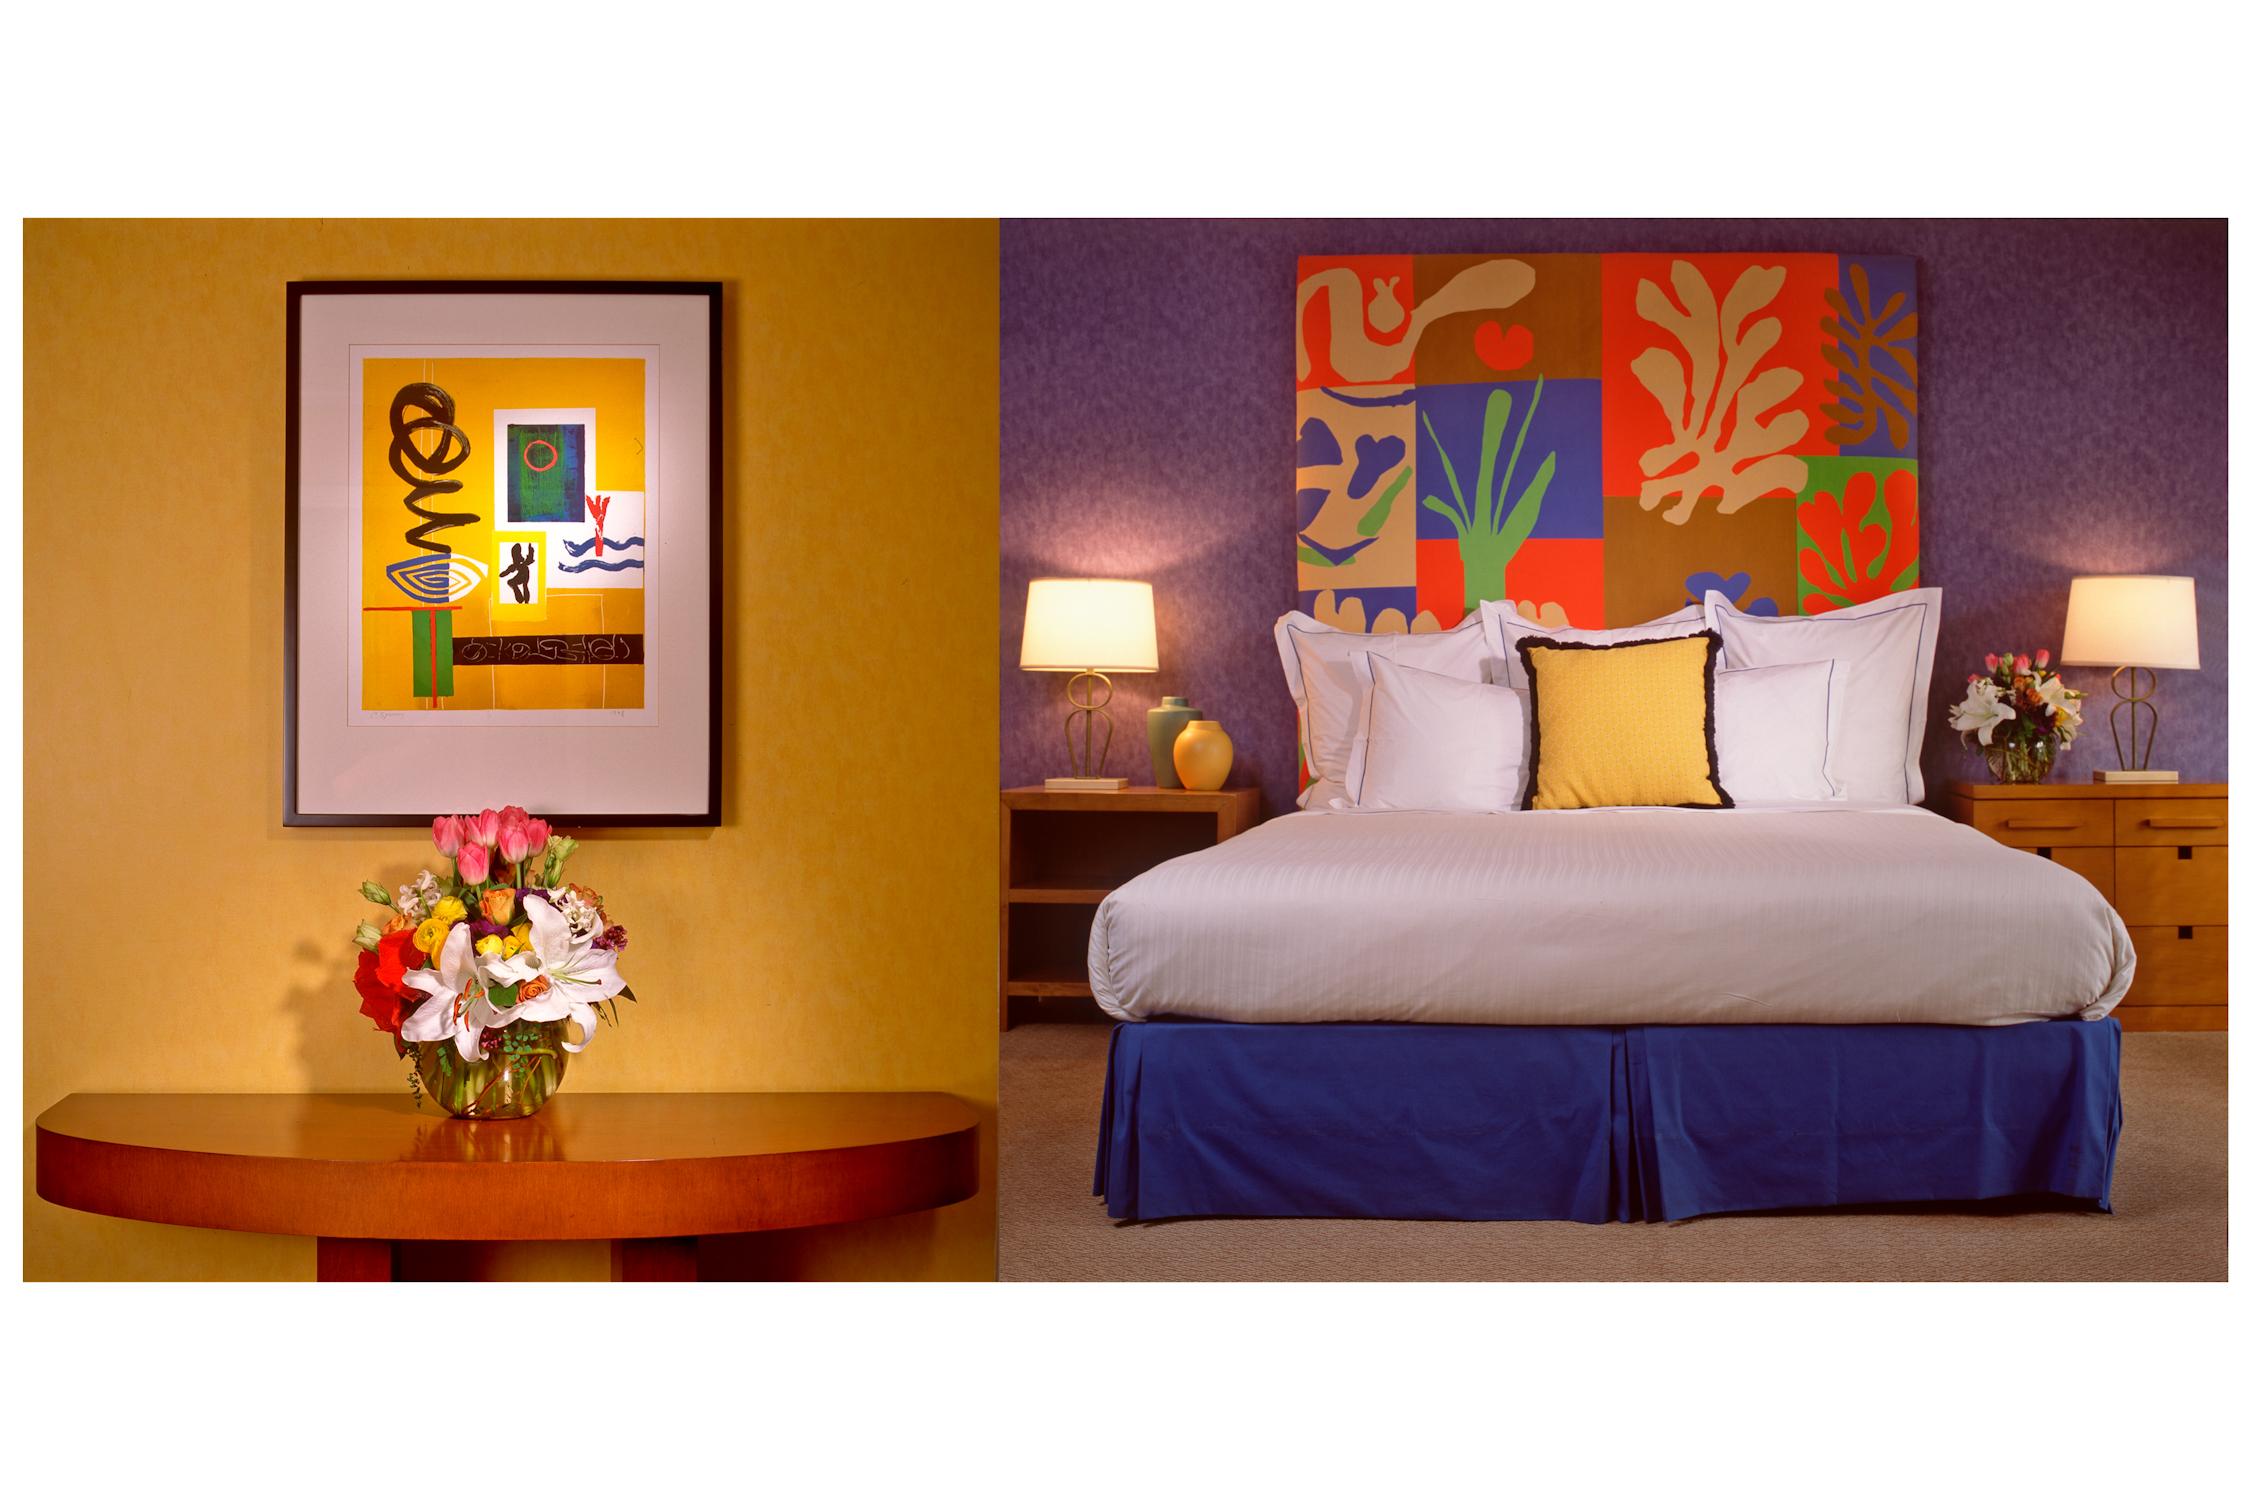 hospitality001.jpg